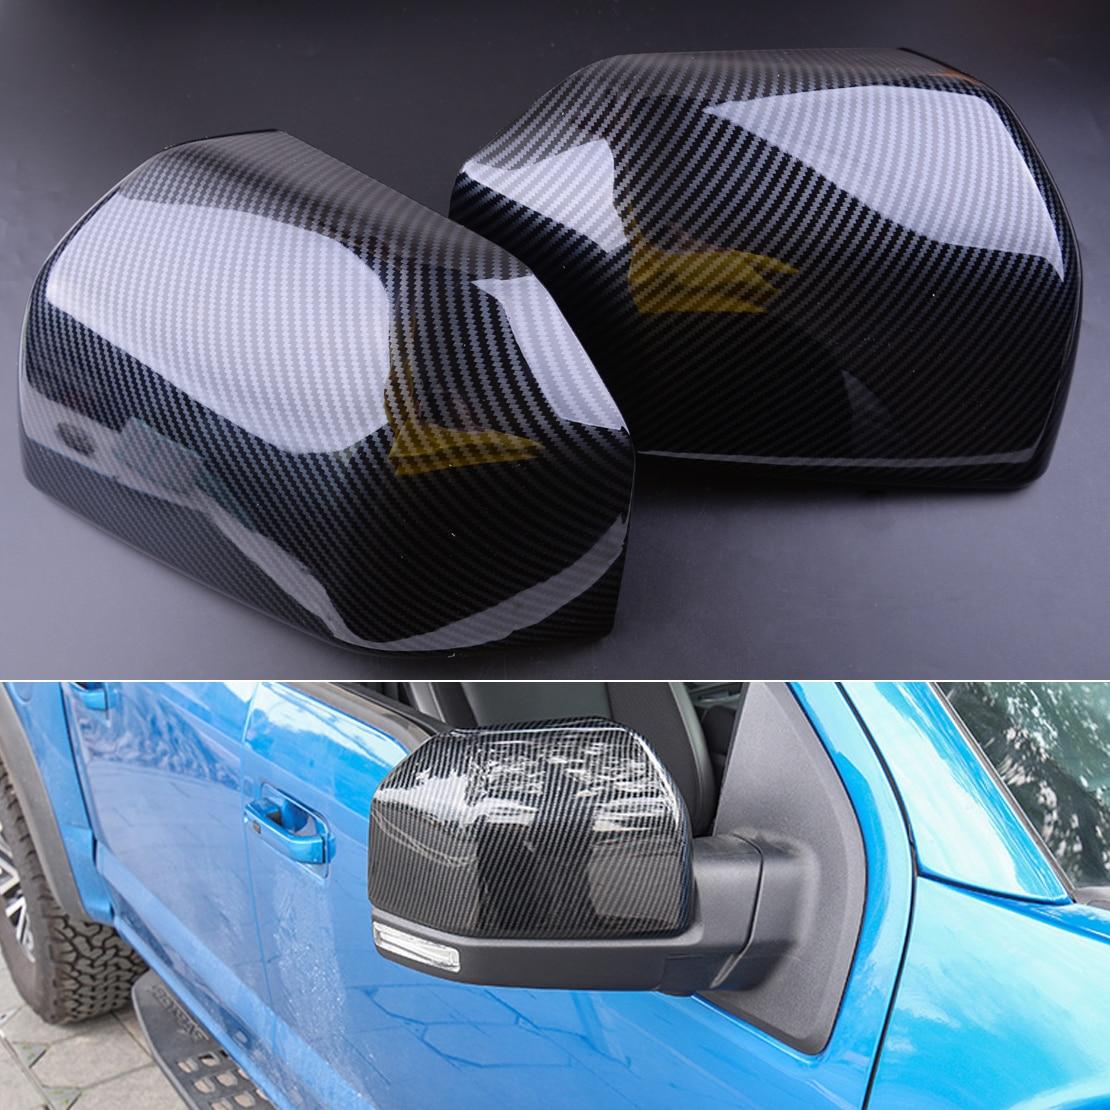 CITALL nueva fibra de carbono ABS 1 par espejo retrovisor del coche cubierta ajuste para Ford F150 2015 2016 2017 2018 2019 XL XLT